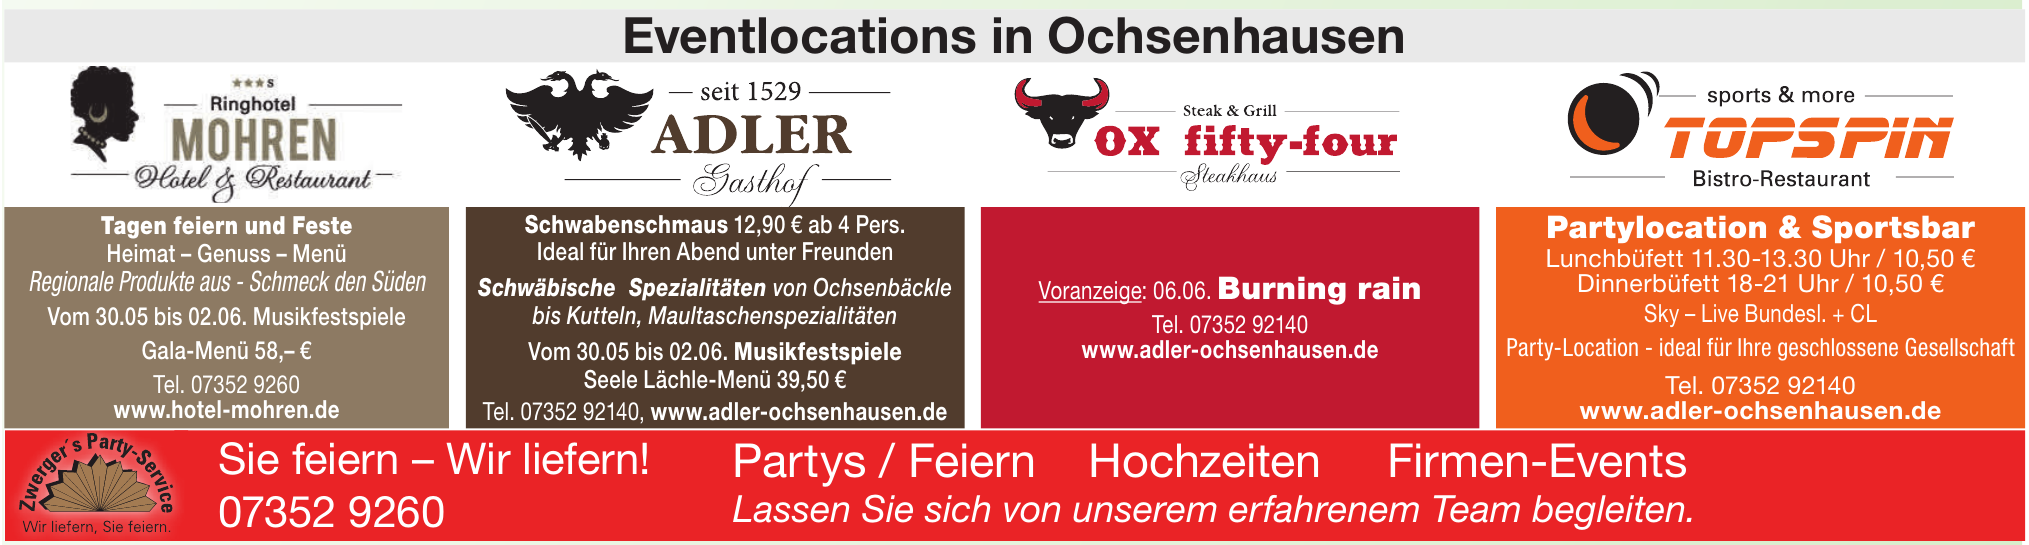 Eventlocations in Ochsenhausen